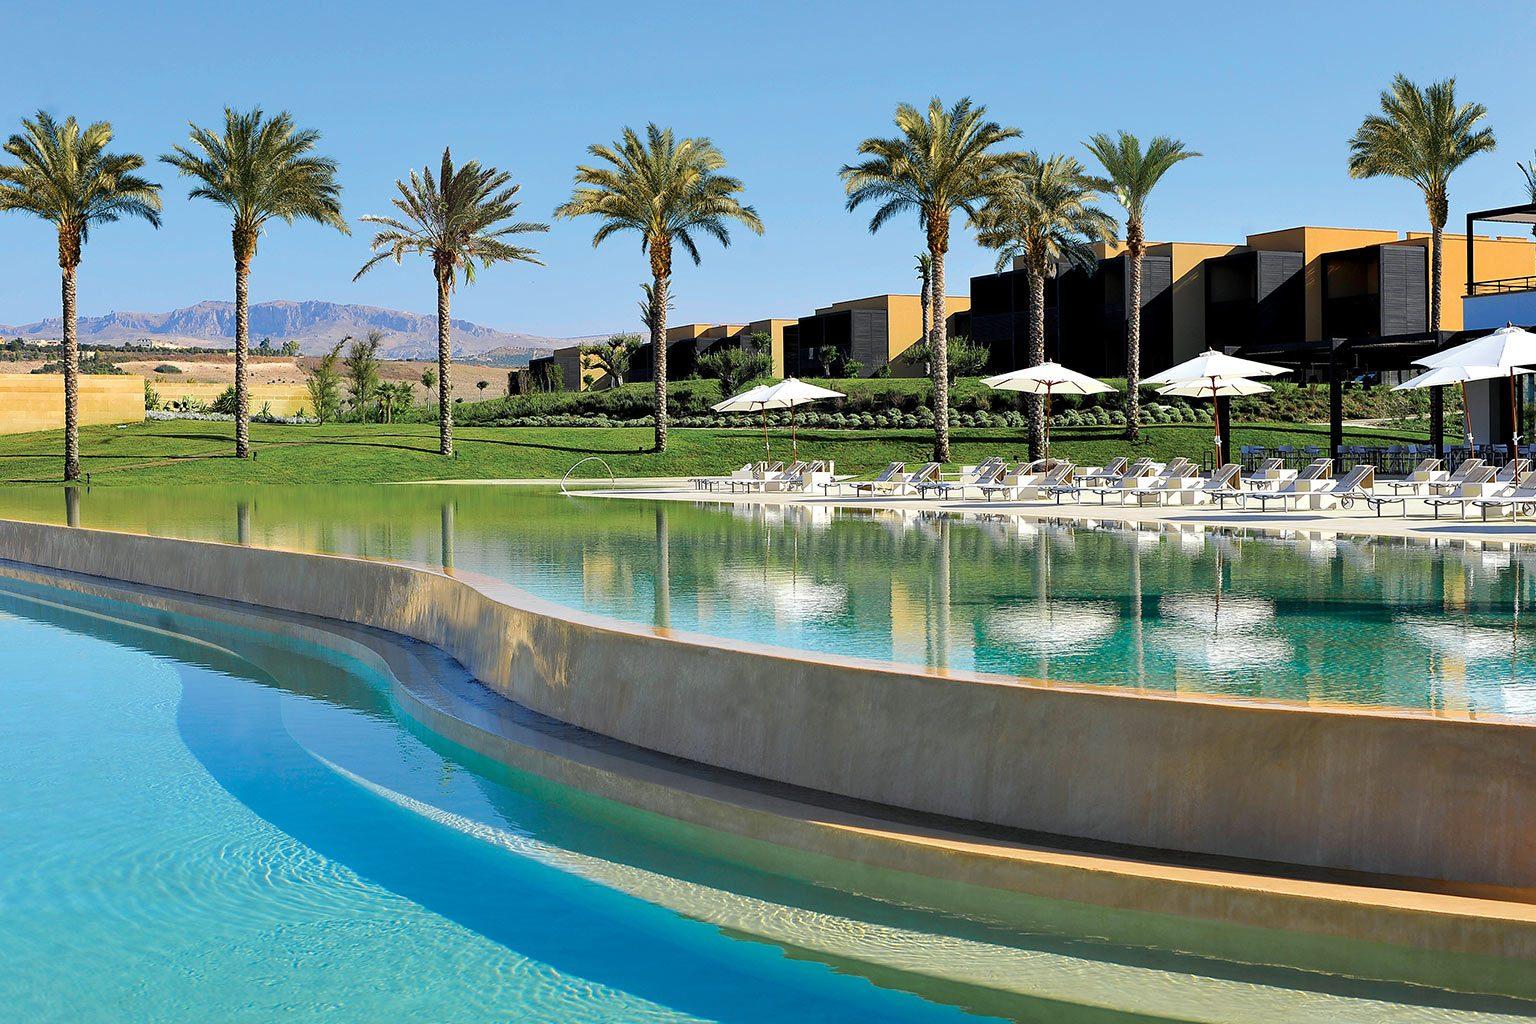 Rocco forte verdura resort designreisen for Sizilien design hotel